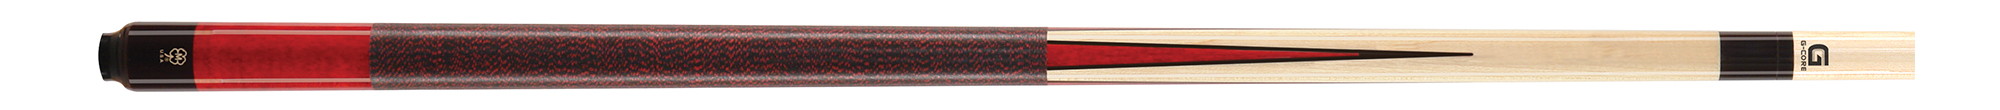 PK3020: McDermott G231 Colorado Red prongs pool Gewicht: 19Oz #1